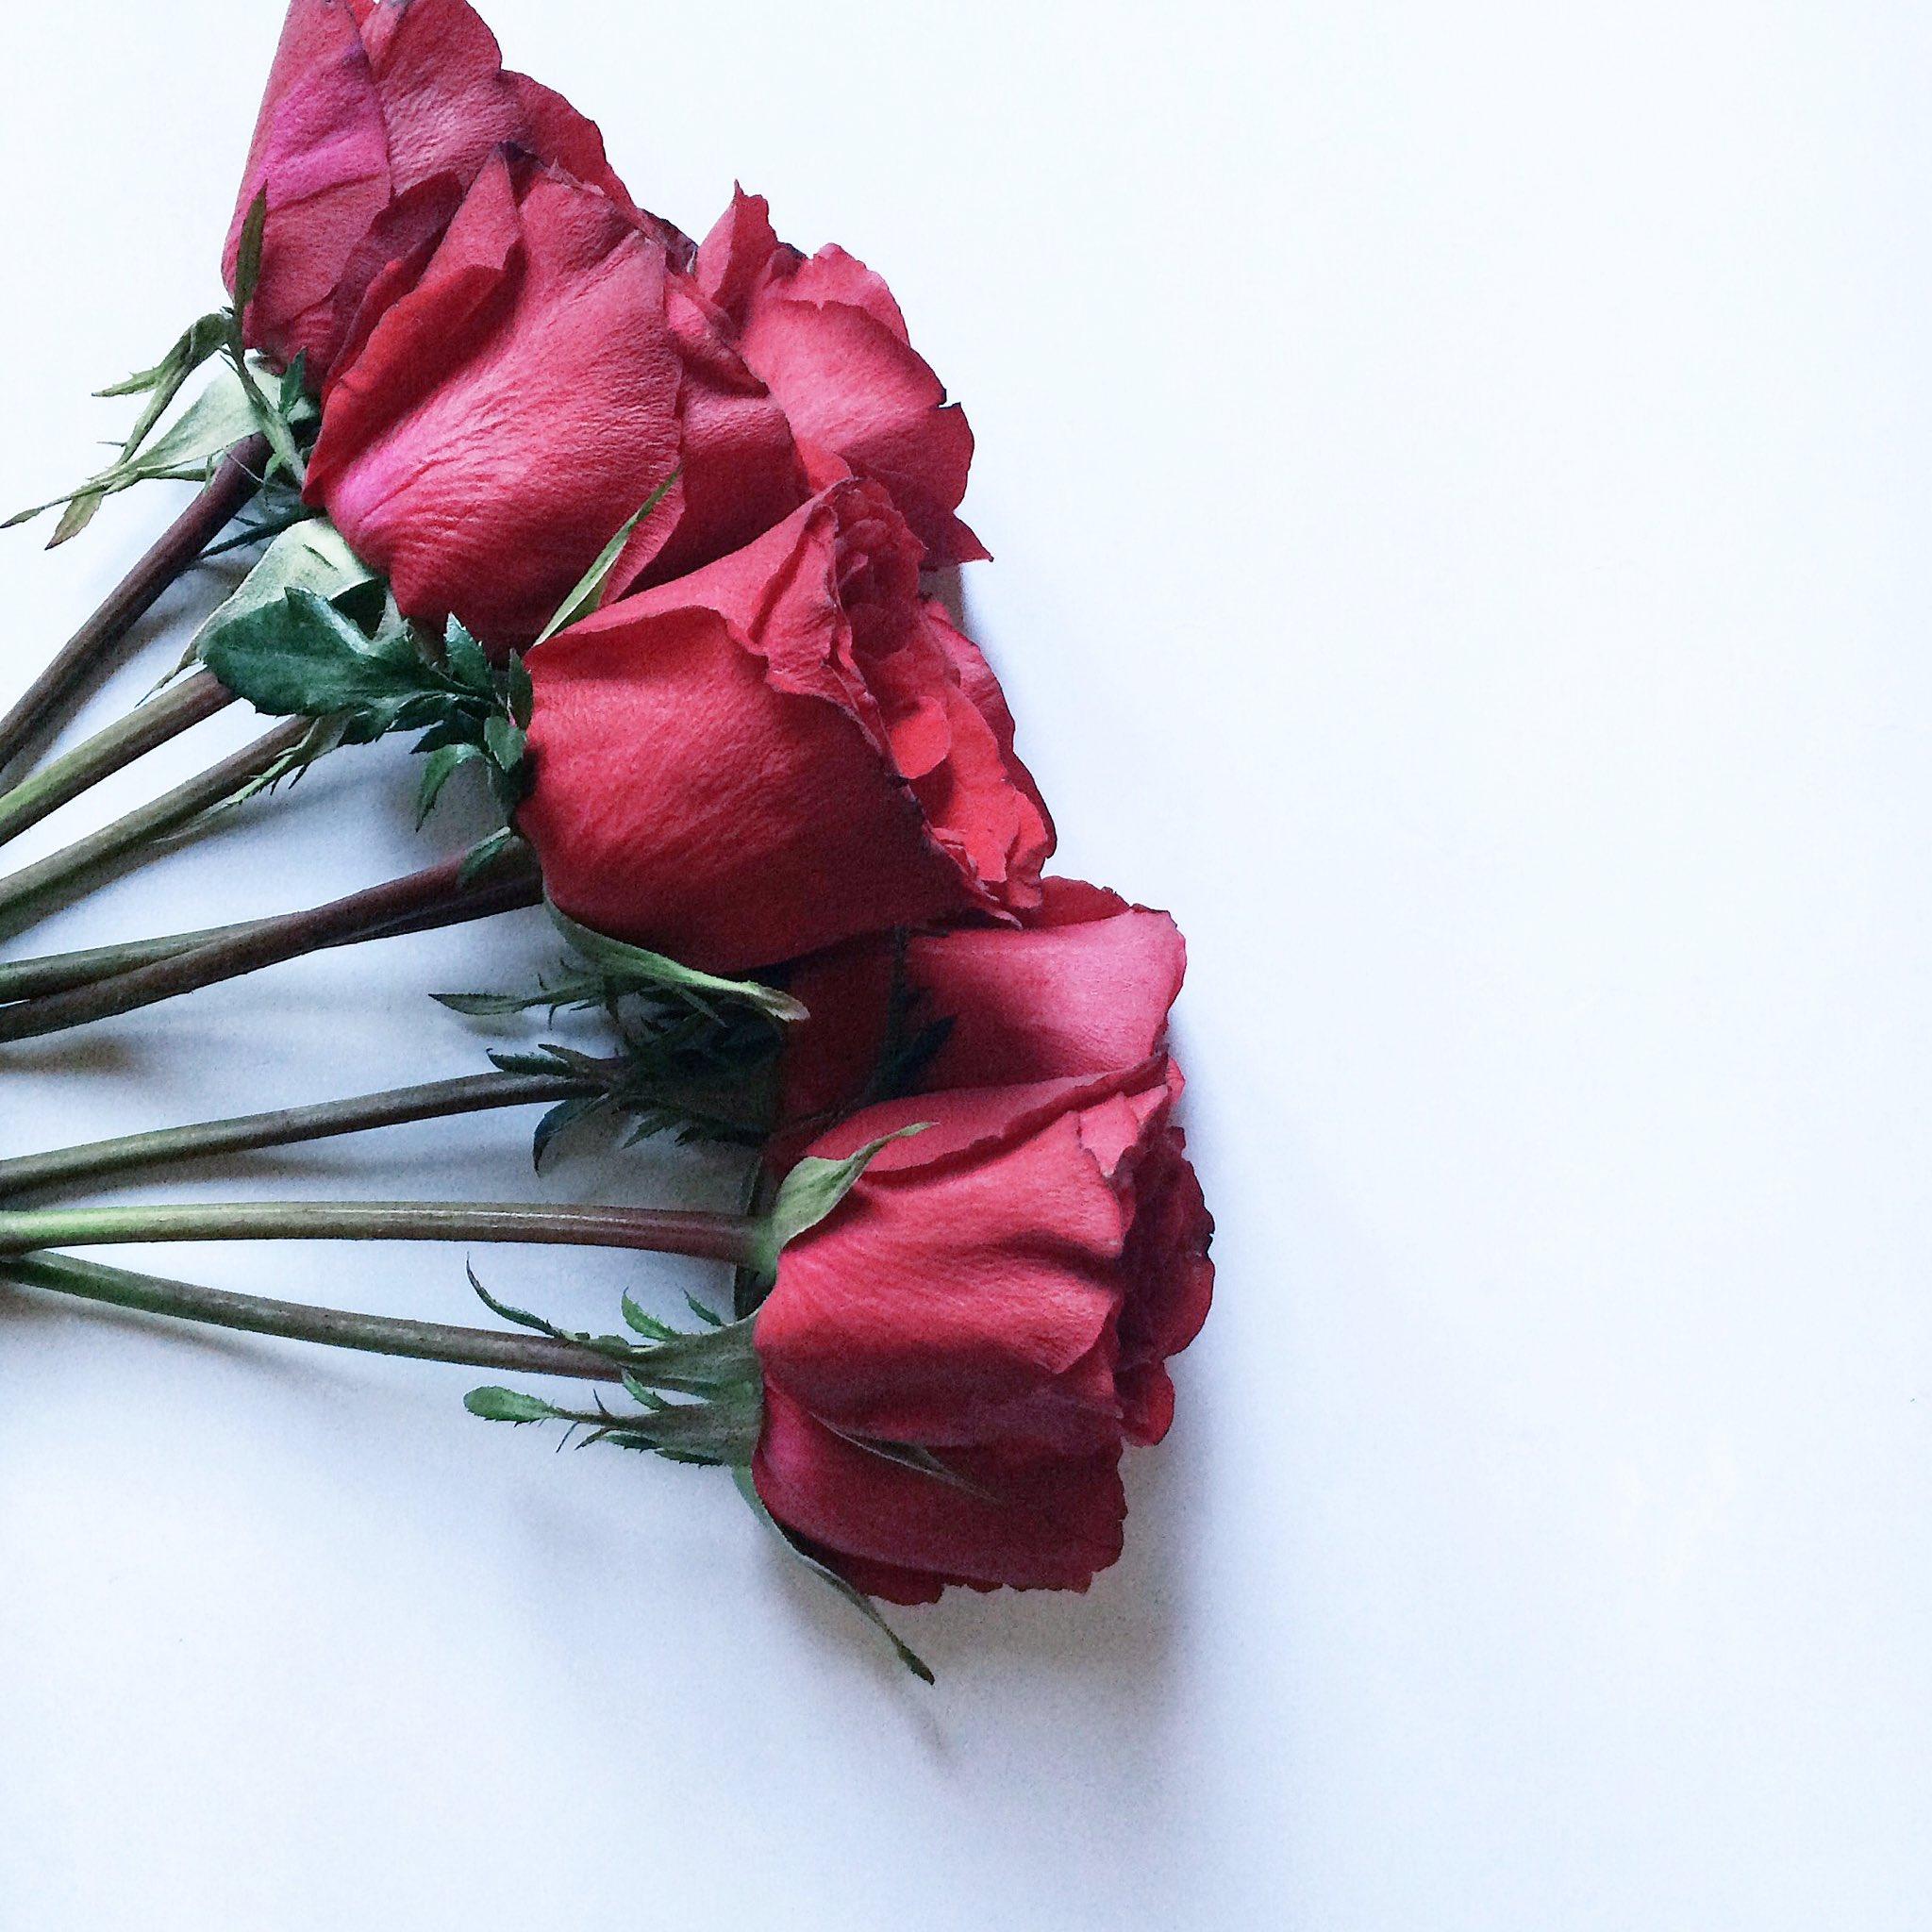 78 Gambar Bunga Editan Vsco Paling Cantik Gambar Bunga